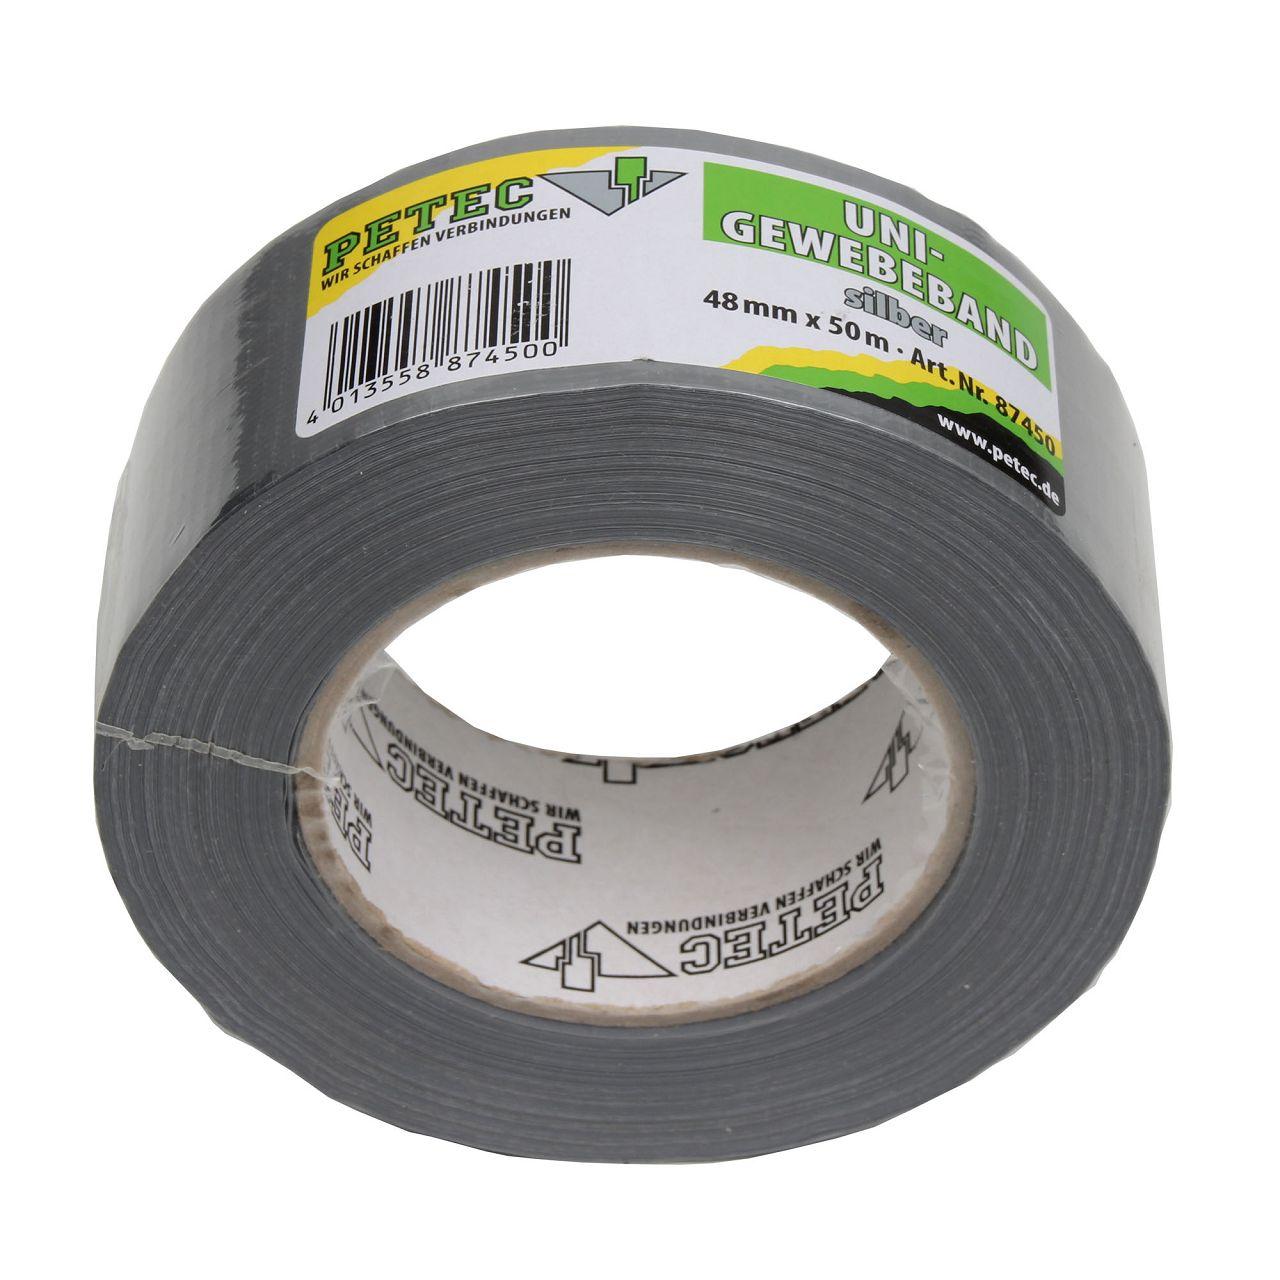 PETEC Uni-Gewebeband Klebeband silber 48mm x 50m 87450